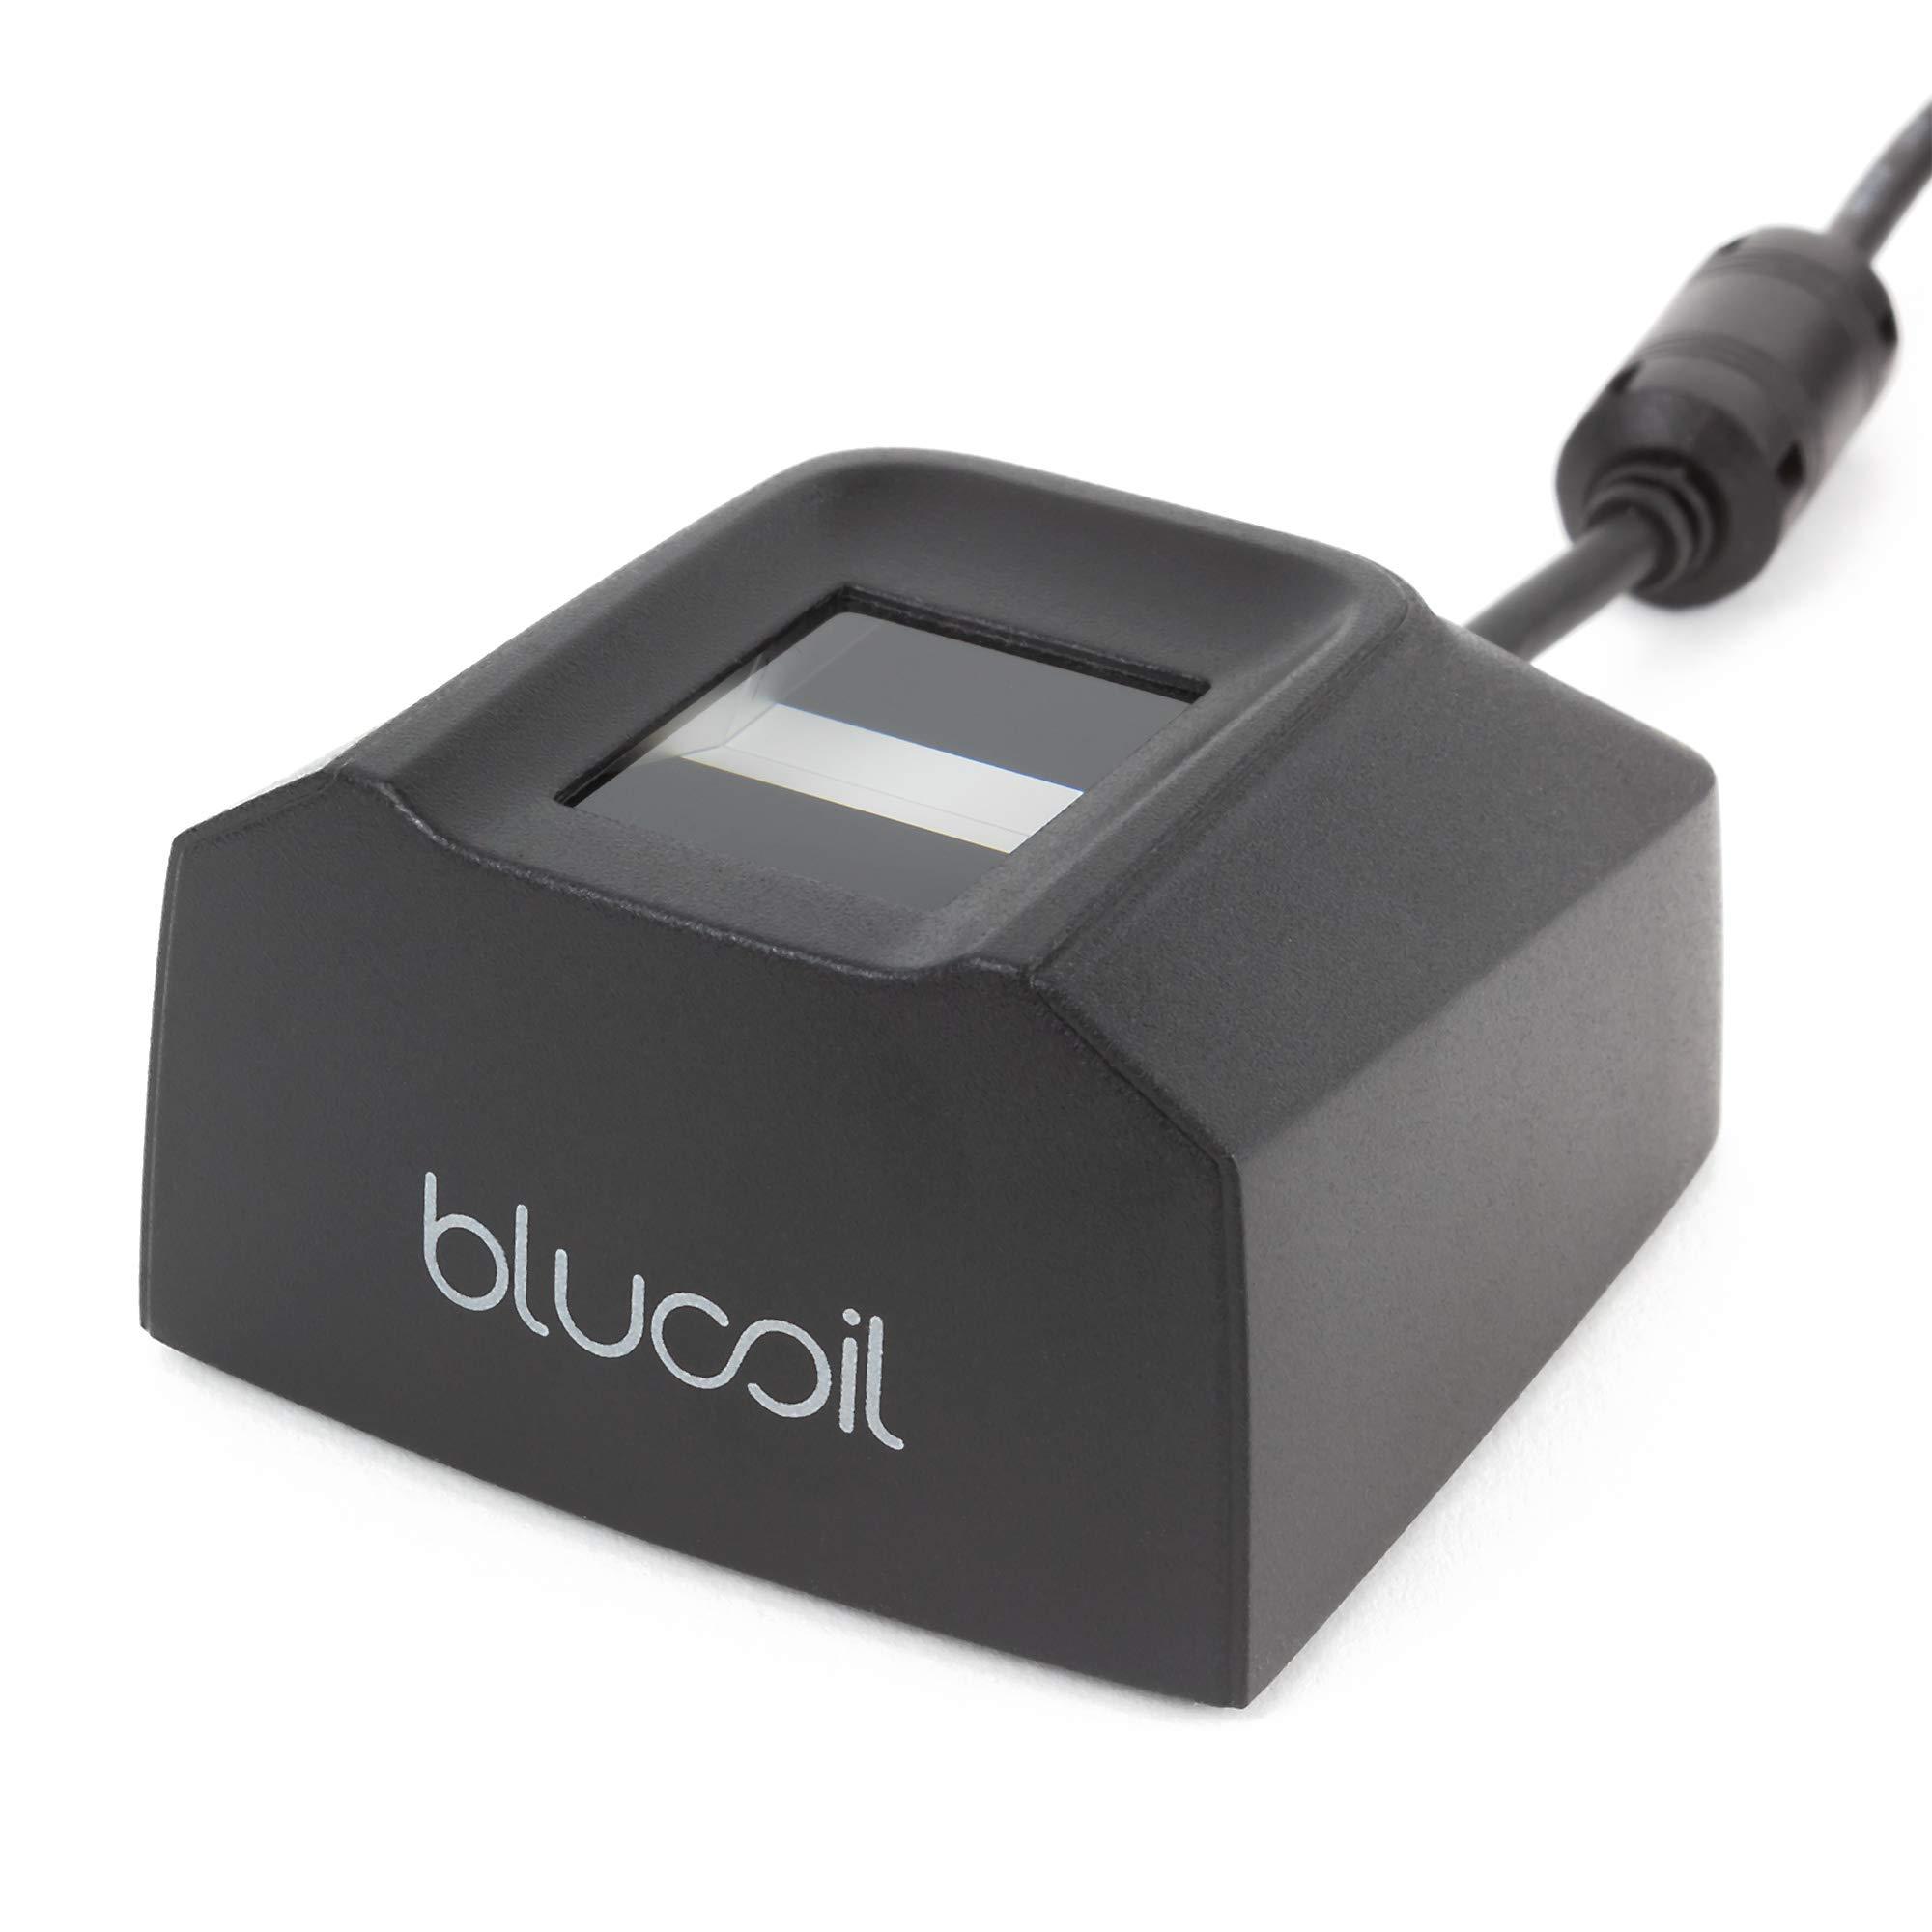 Blucoil Secugen Hamster Pro 20 Optical USB Fingerprint Scanner by blucoil